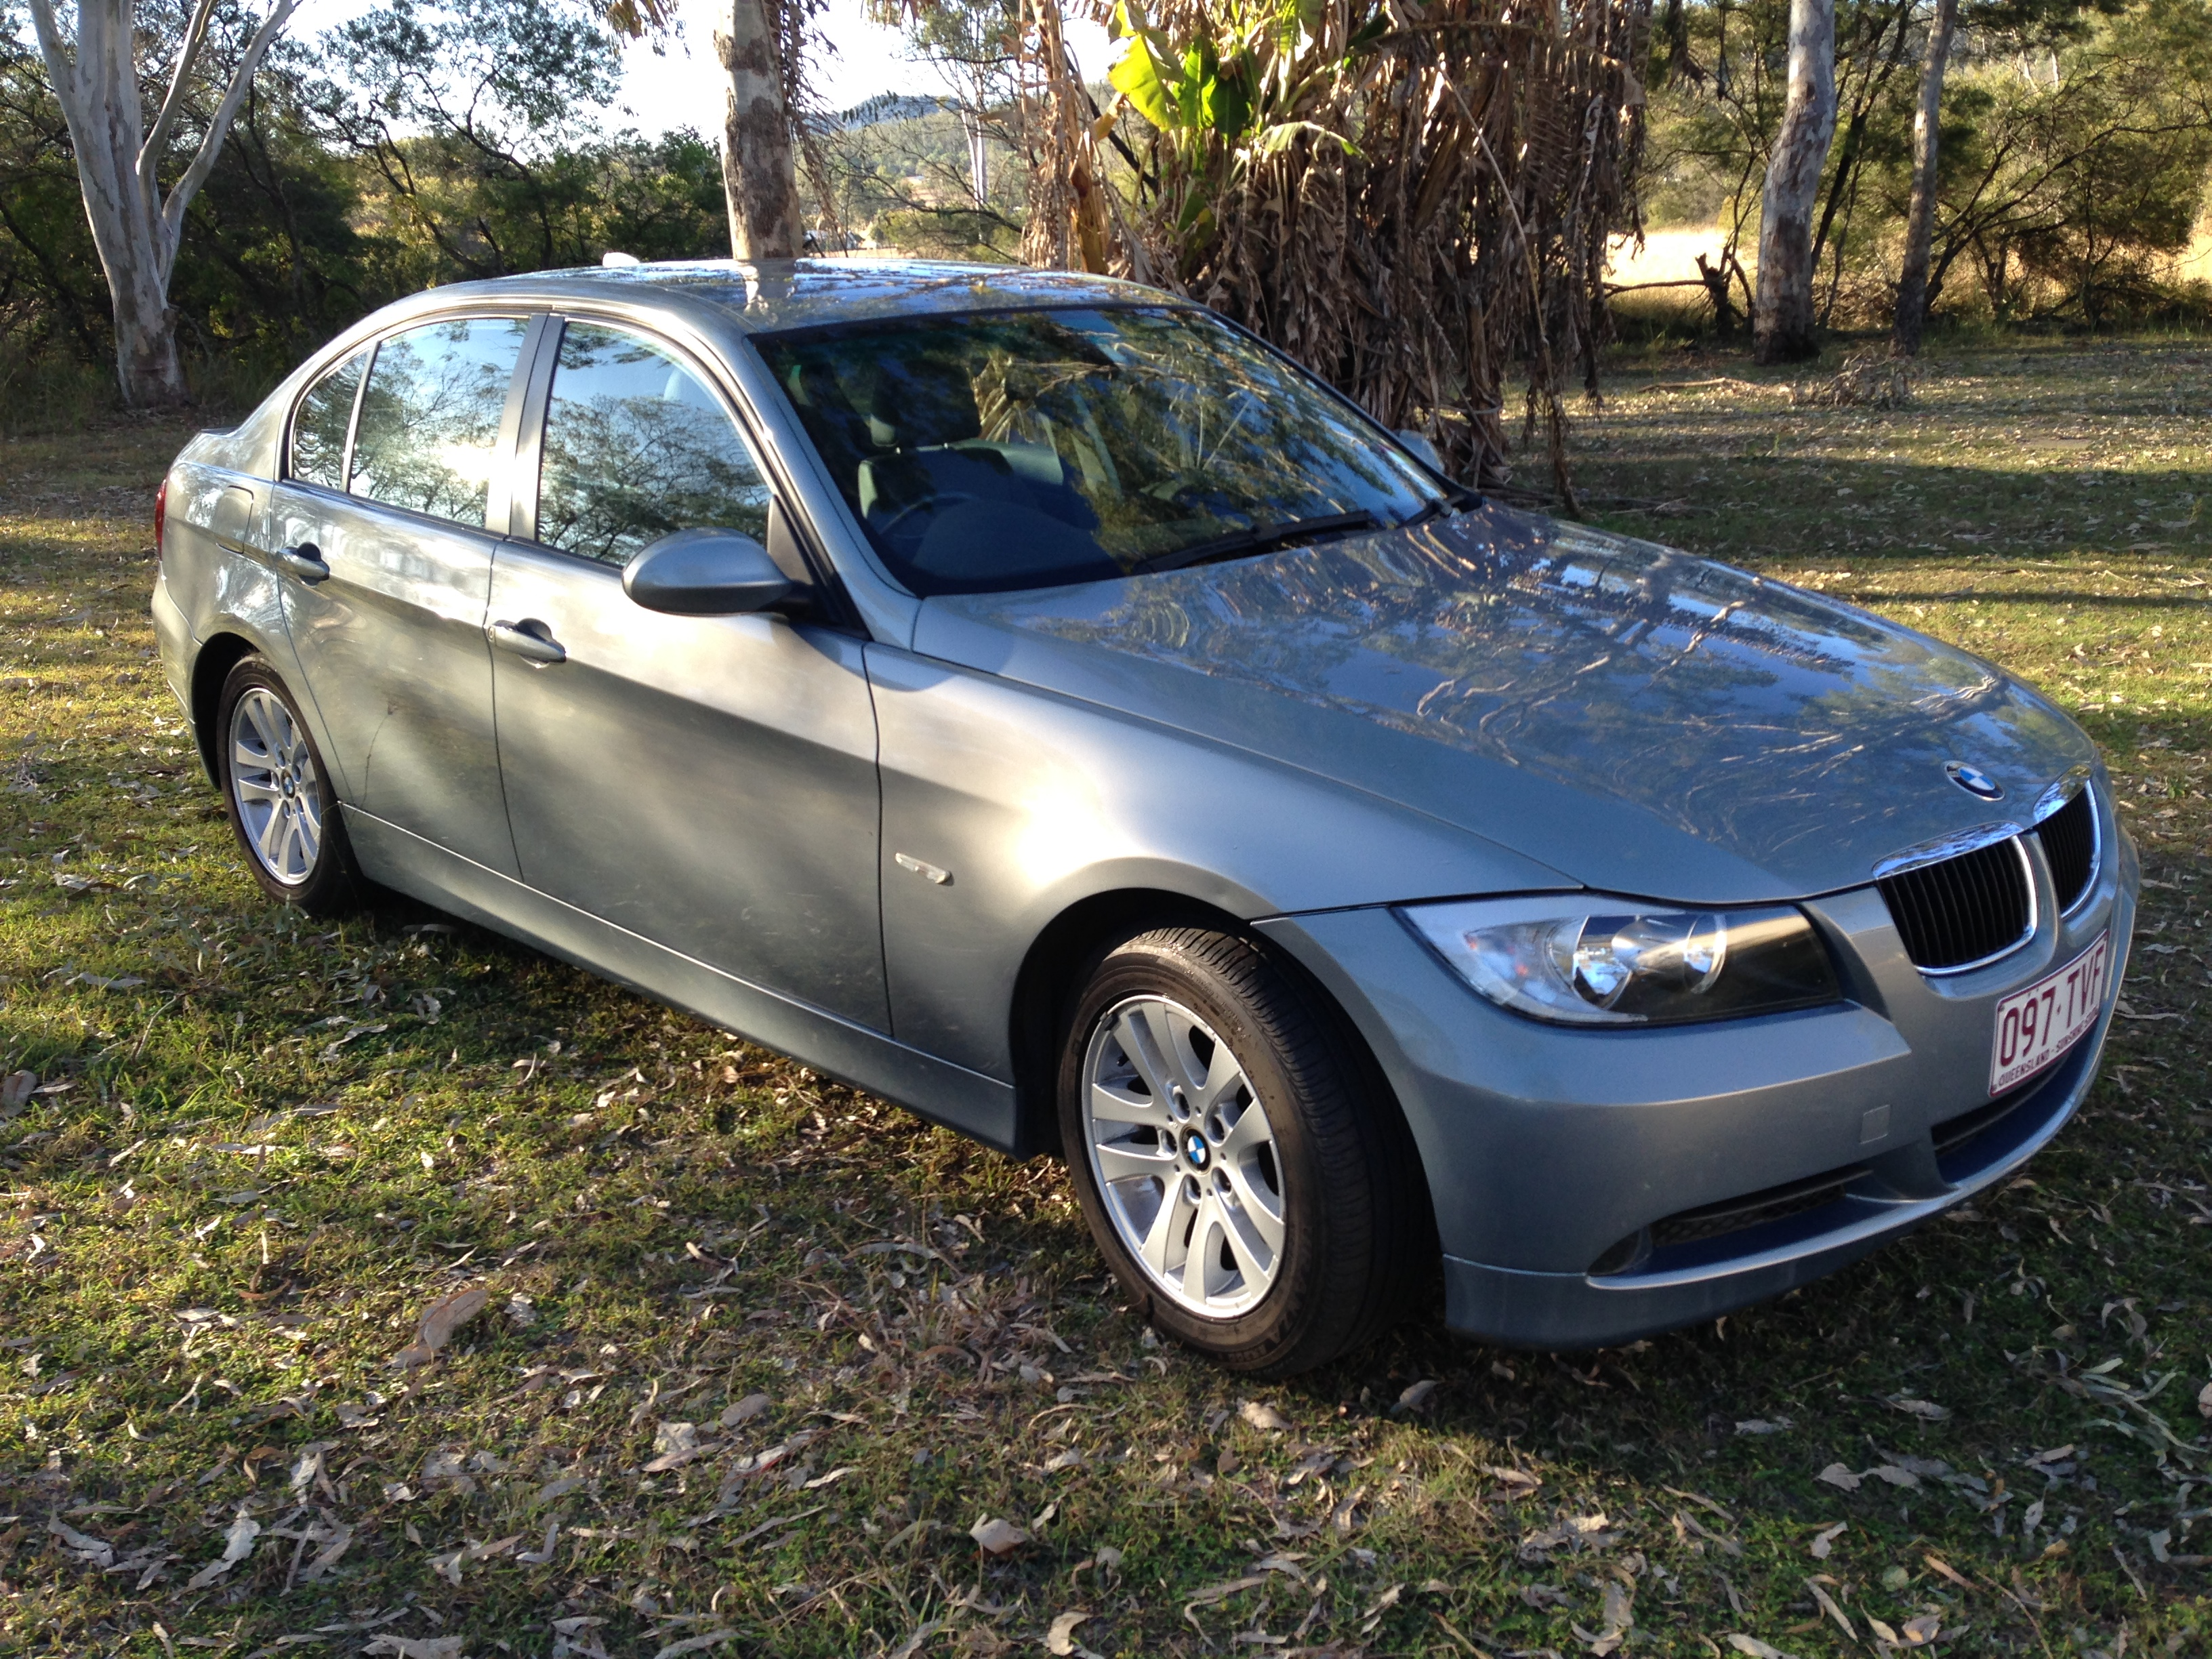 Used BMWs For Sale >> 2007 BMW 320i E90 | Car Sales QLD: Gold Coast #2976847